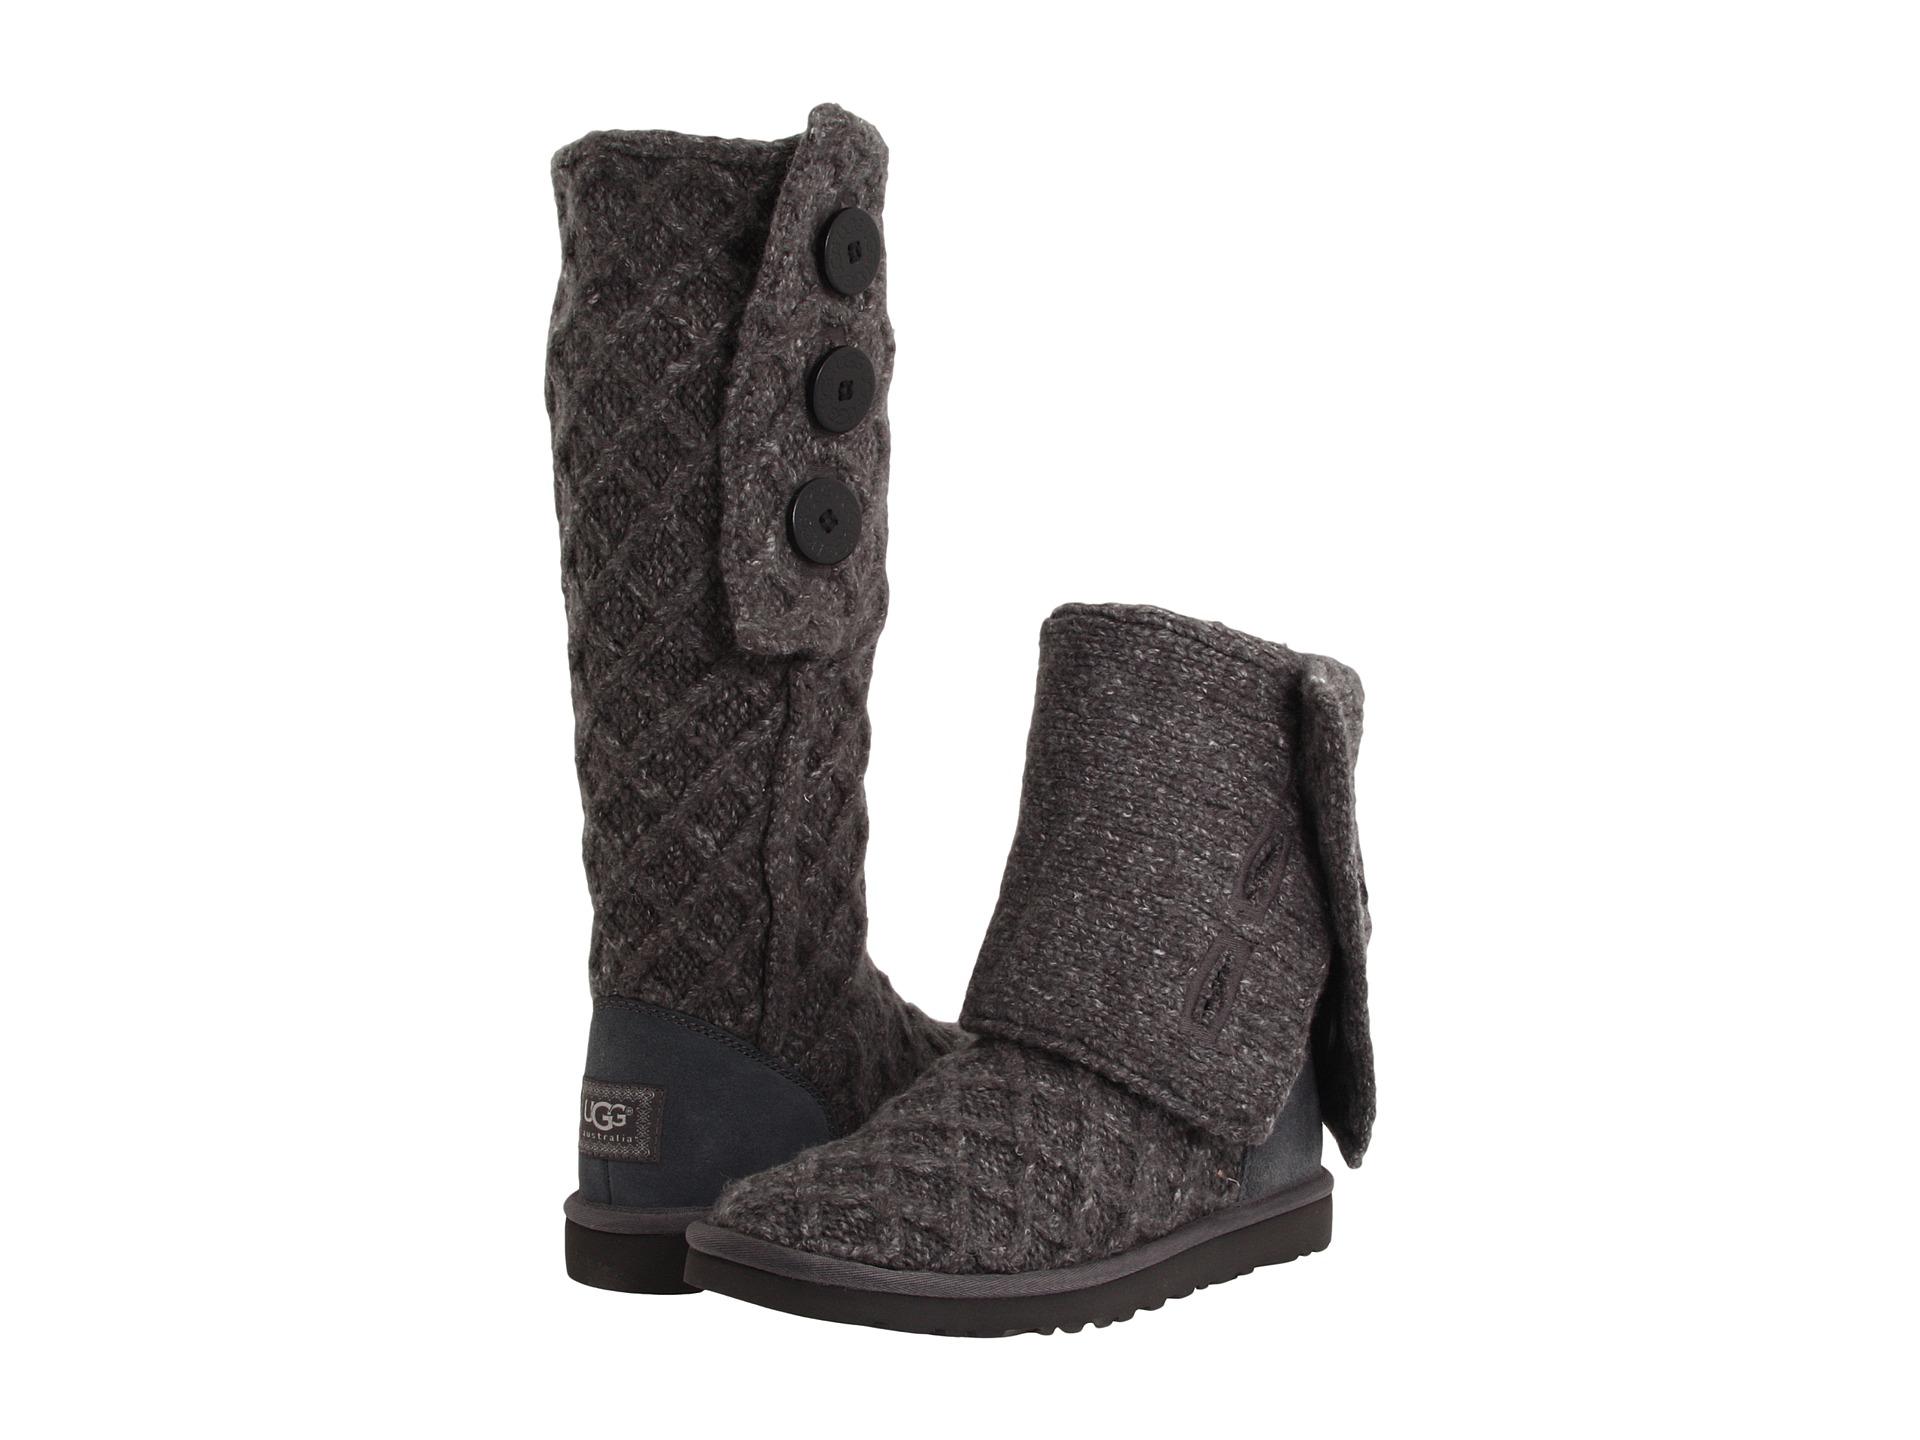 uggs knit boots lattice